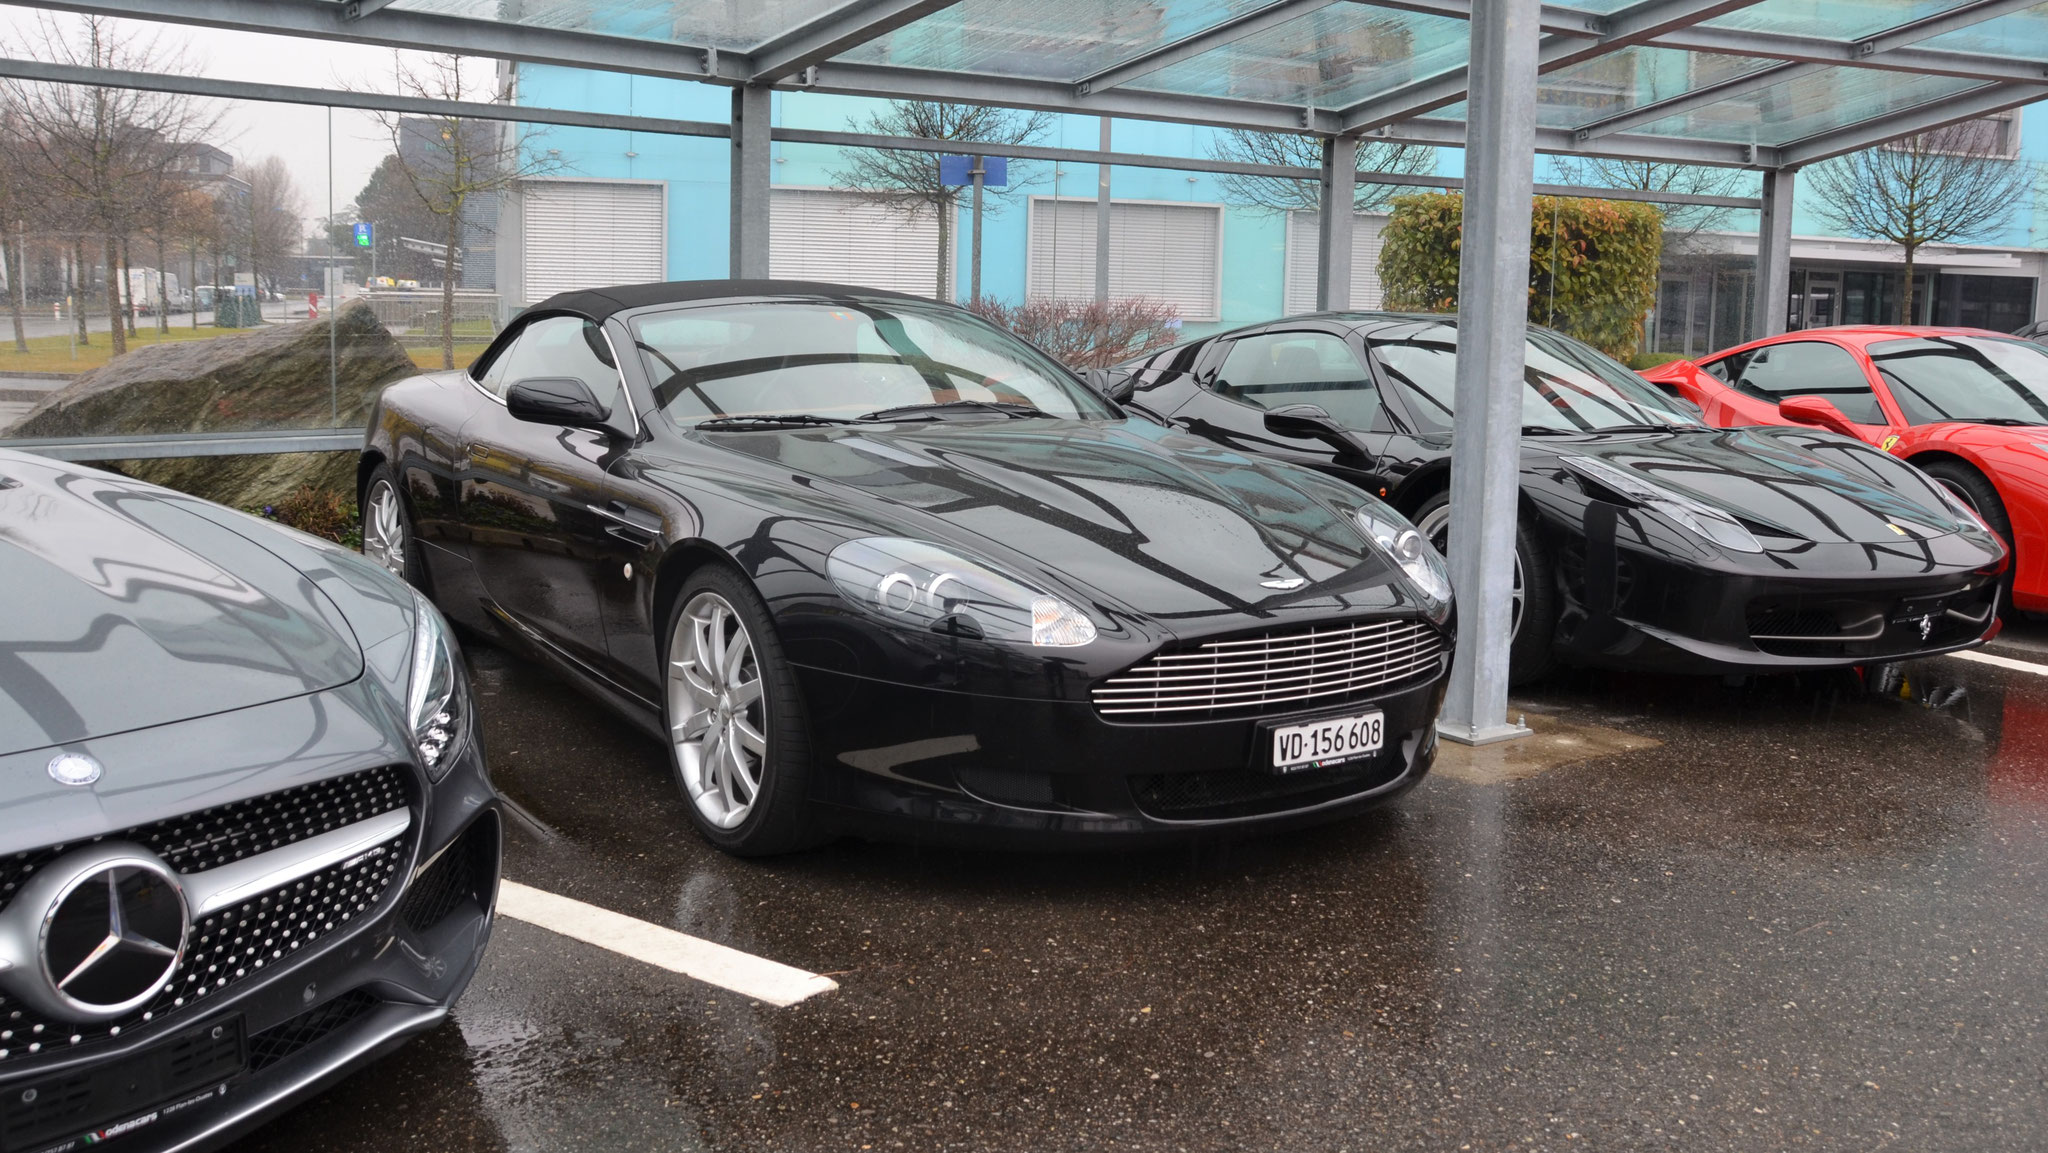 Aston Martin DB9 Volante - VD-156608 (CH)